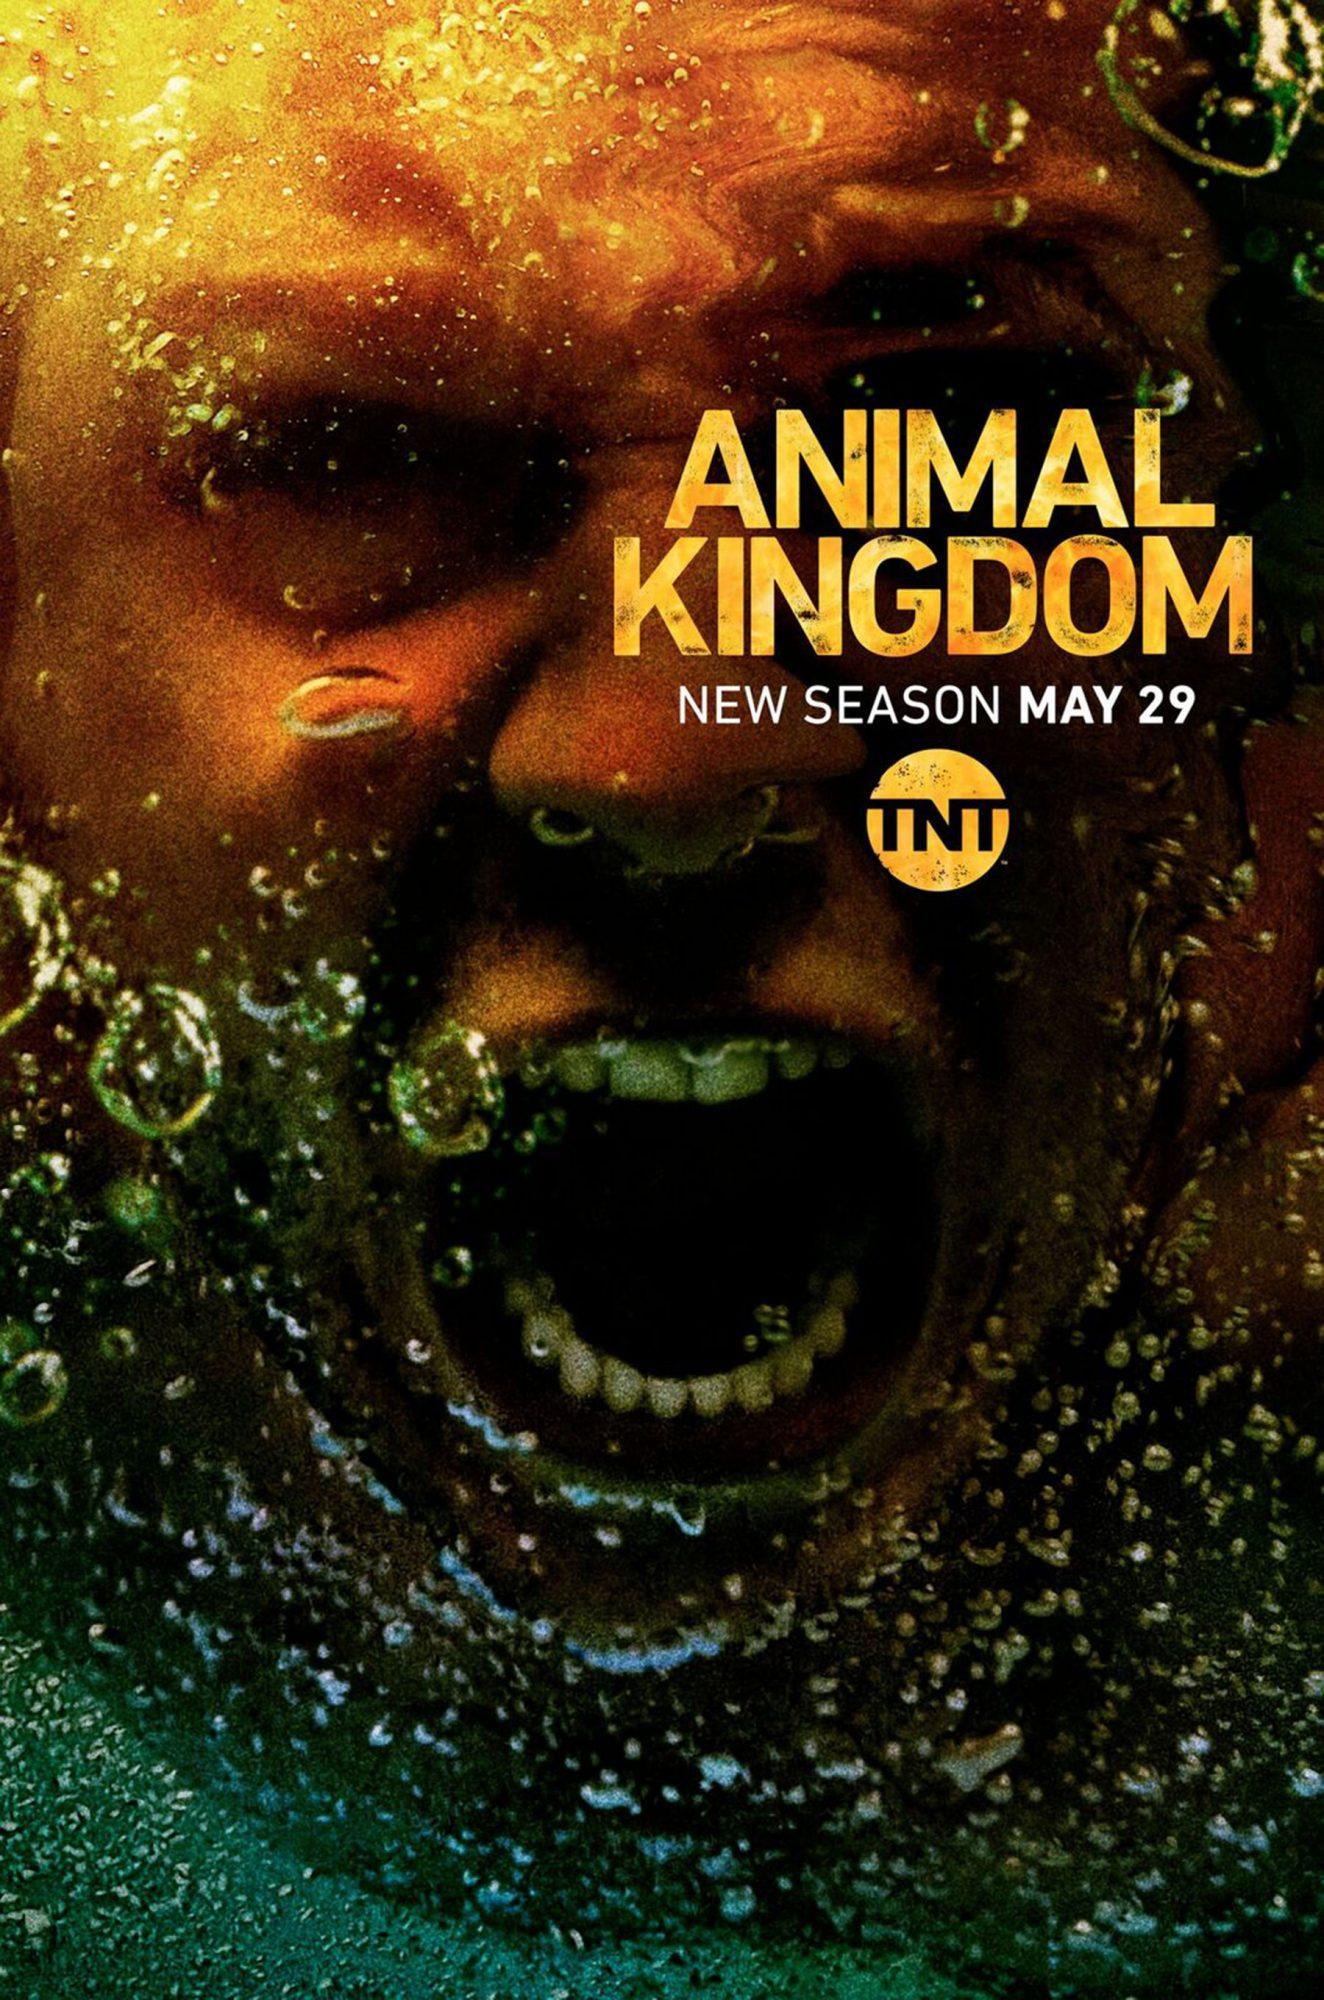 28_V1987_AnimalKingdomS3_Techwood_18_3x12_1_w4_FIN01_toTrim_preview